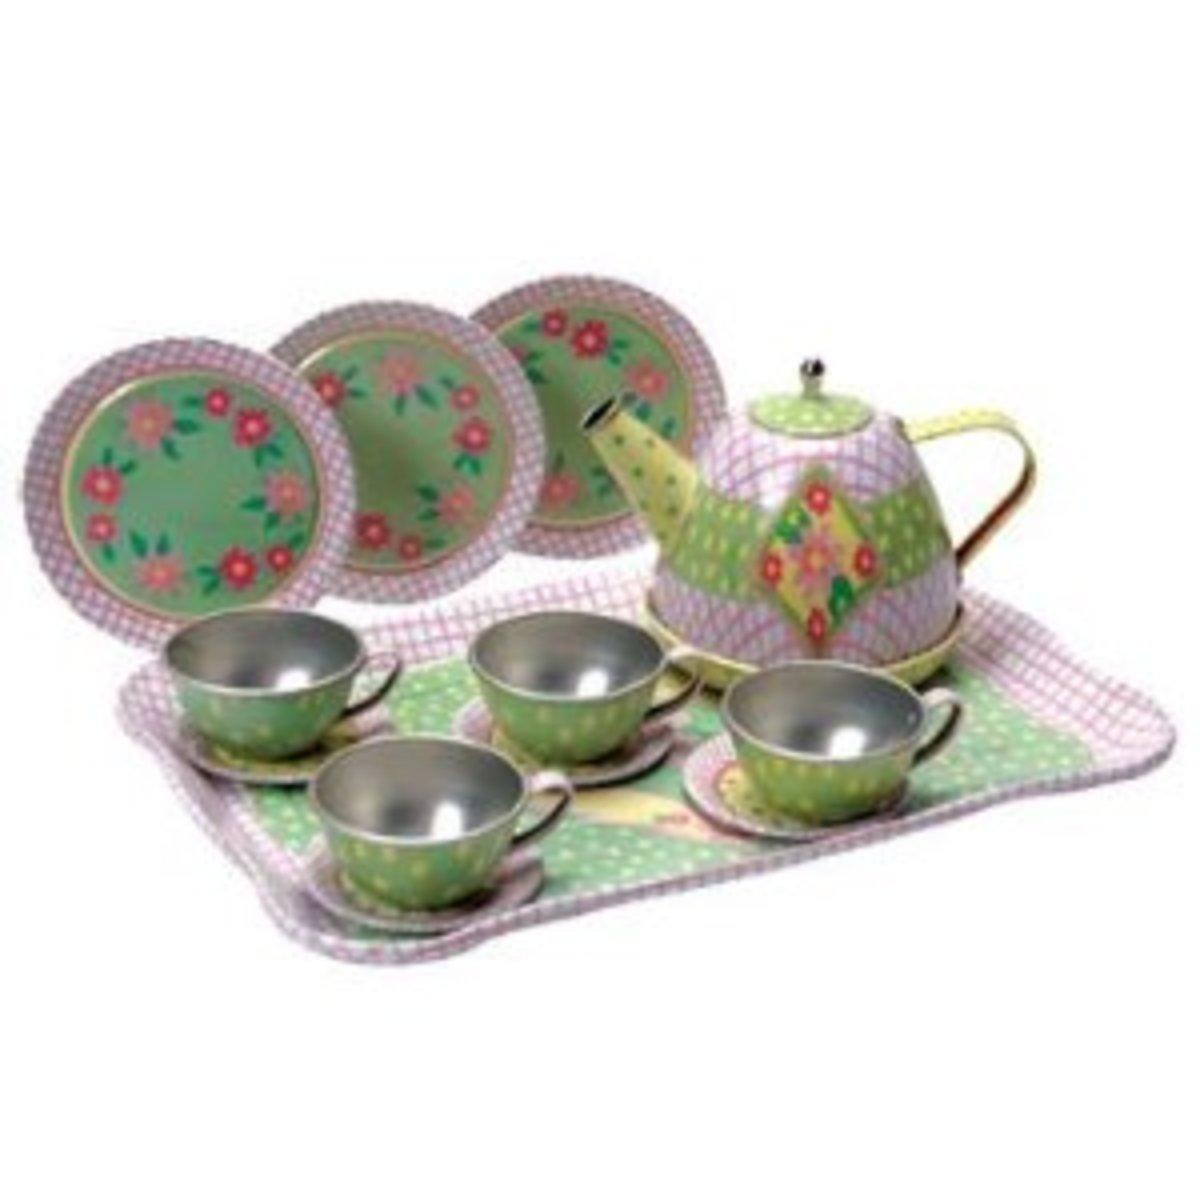 Childrens Tin Tea Set